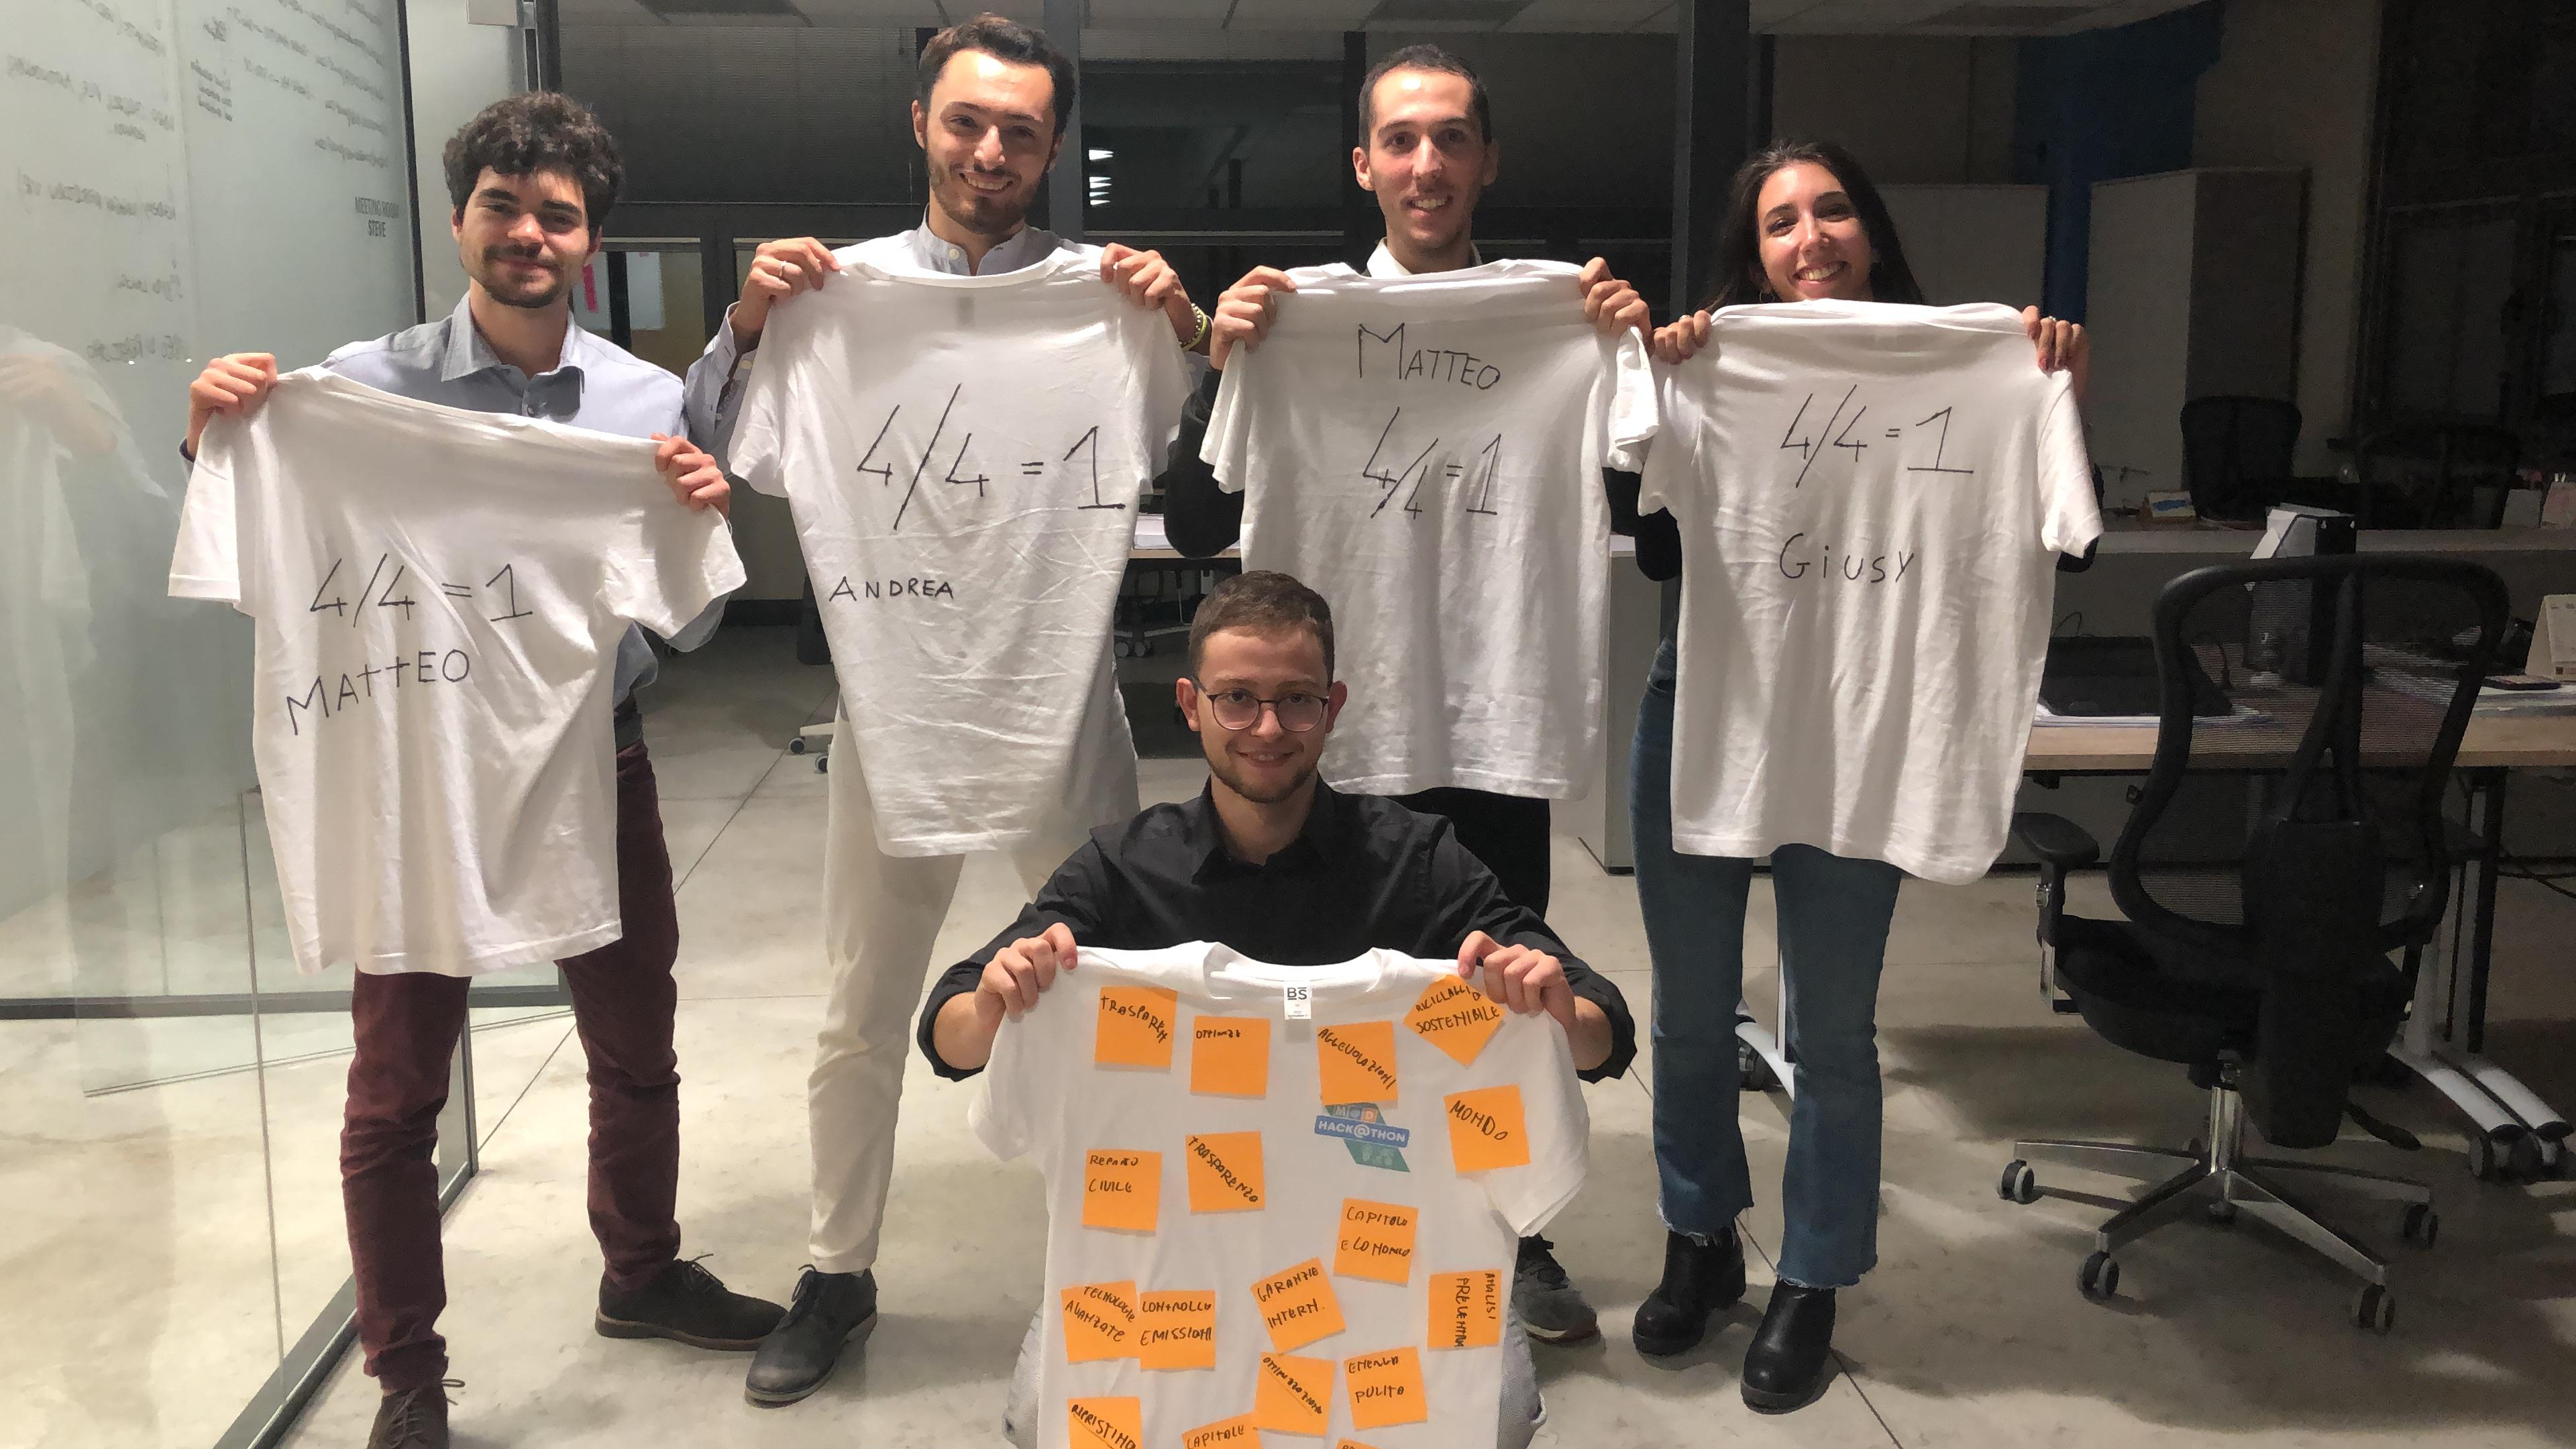 Hackathon - ironia ultimi arrivati